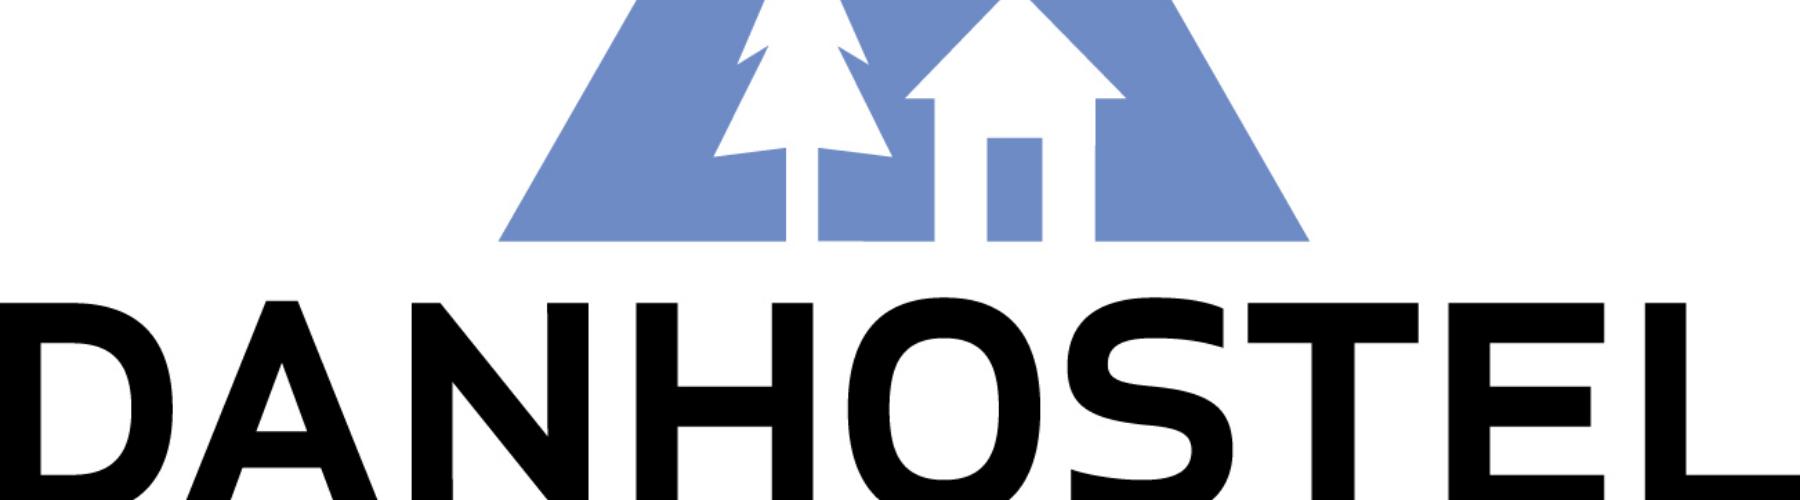 Danhostel logo  cover image